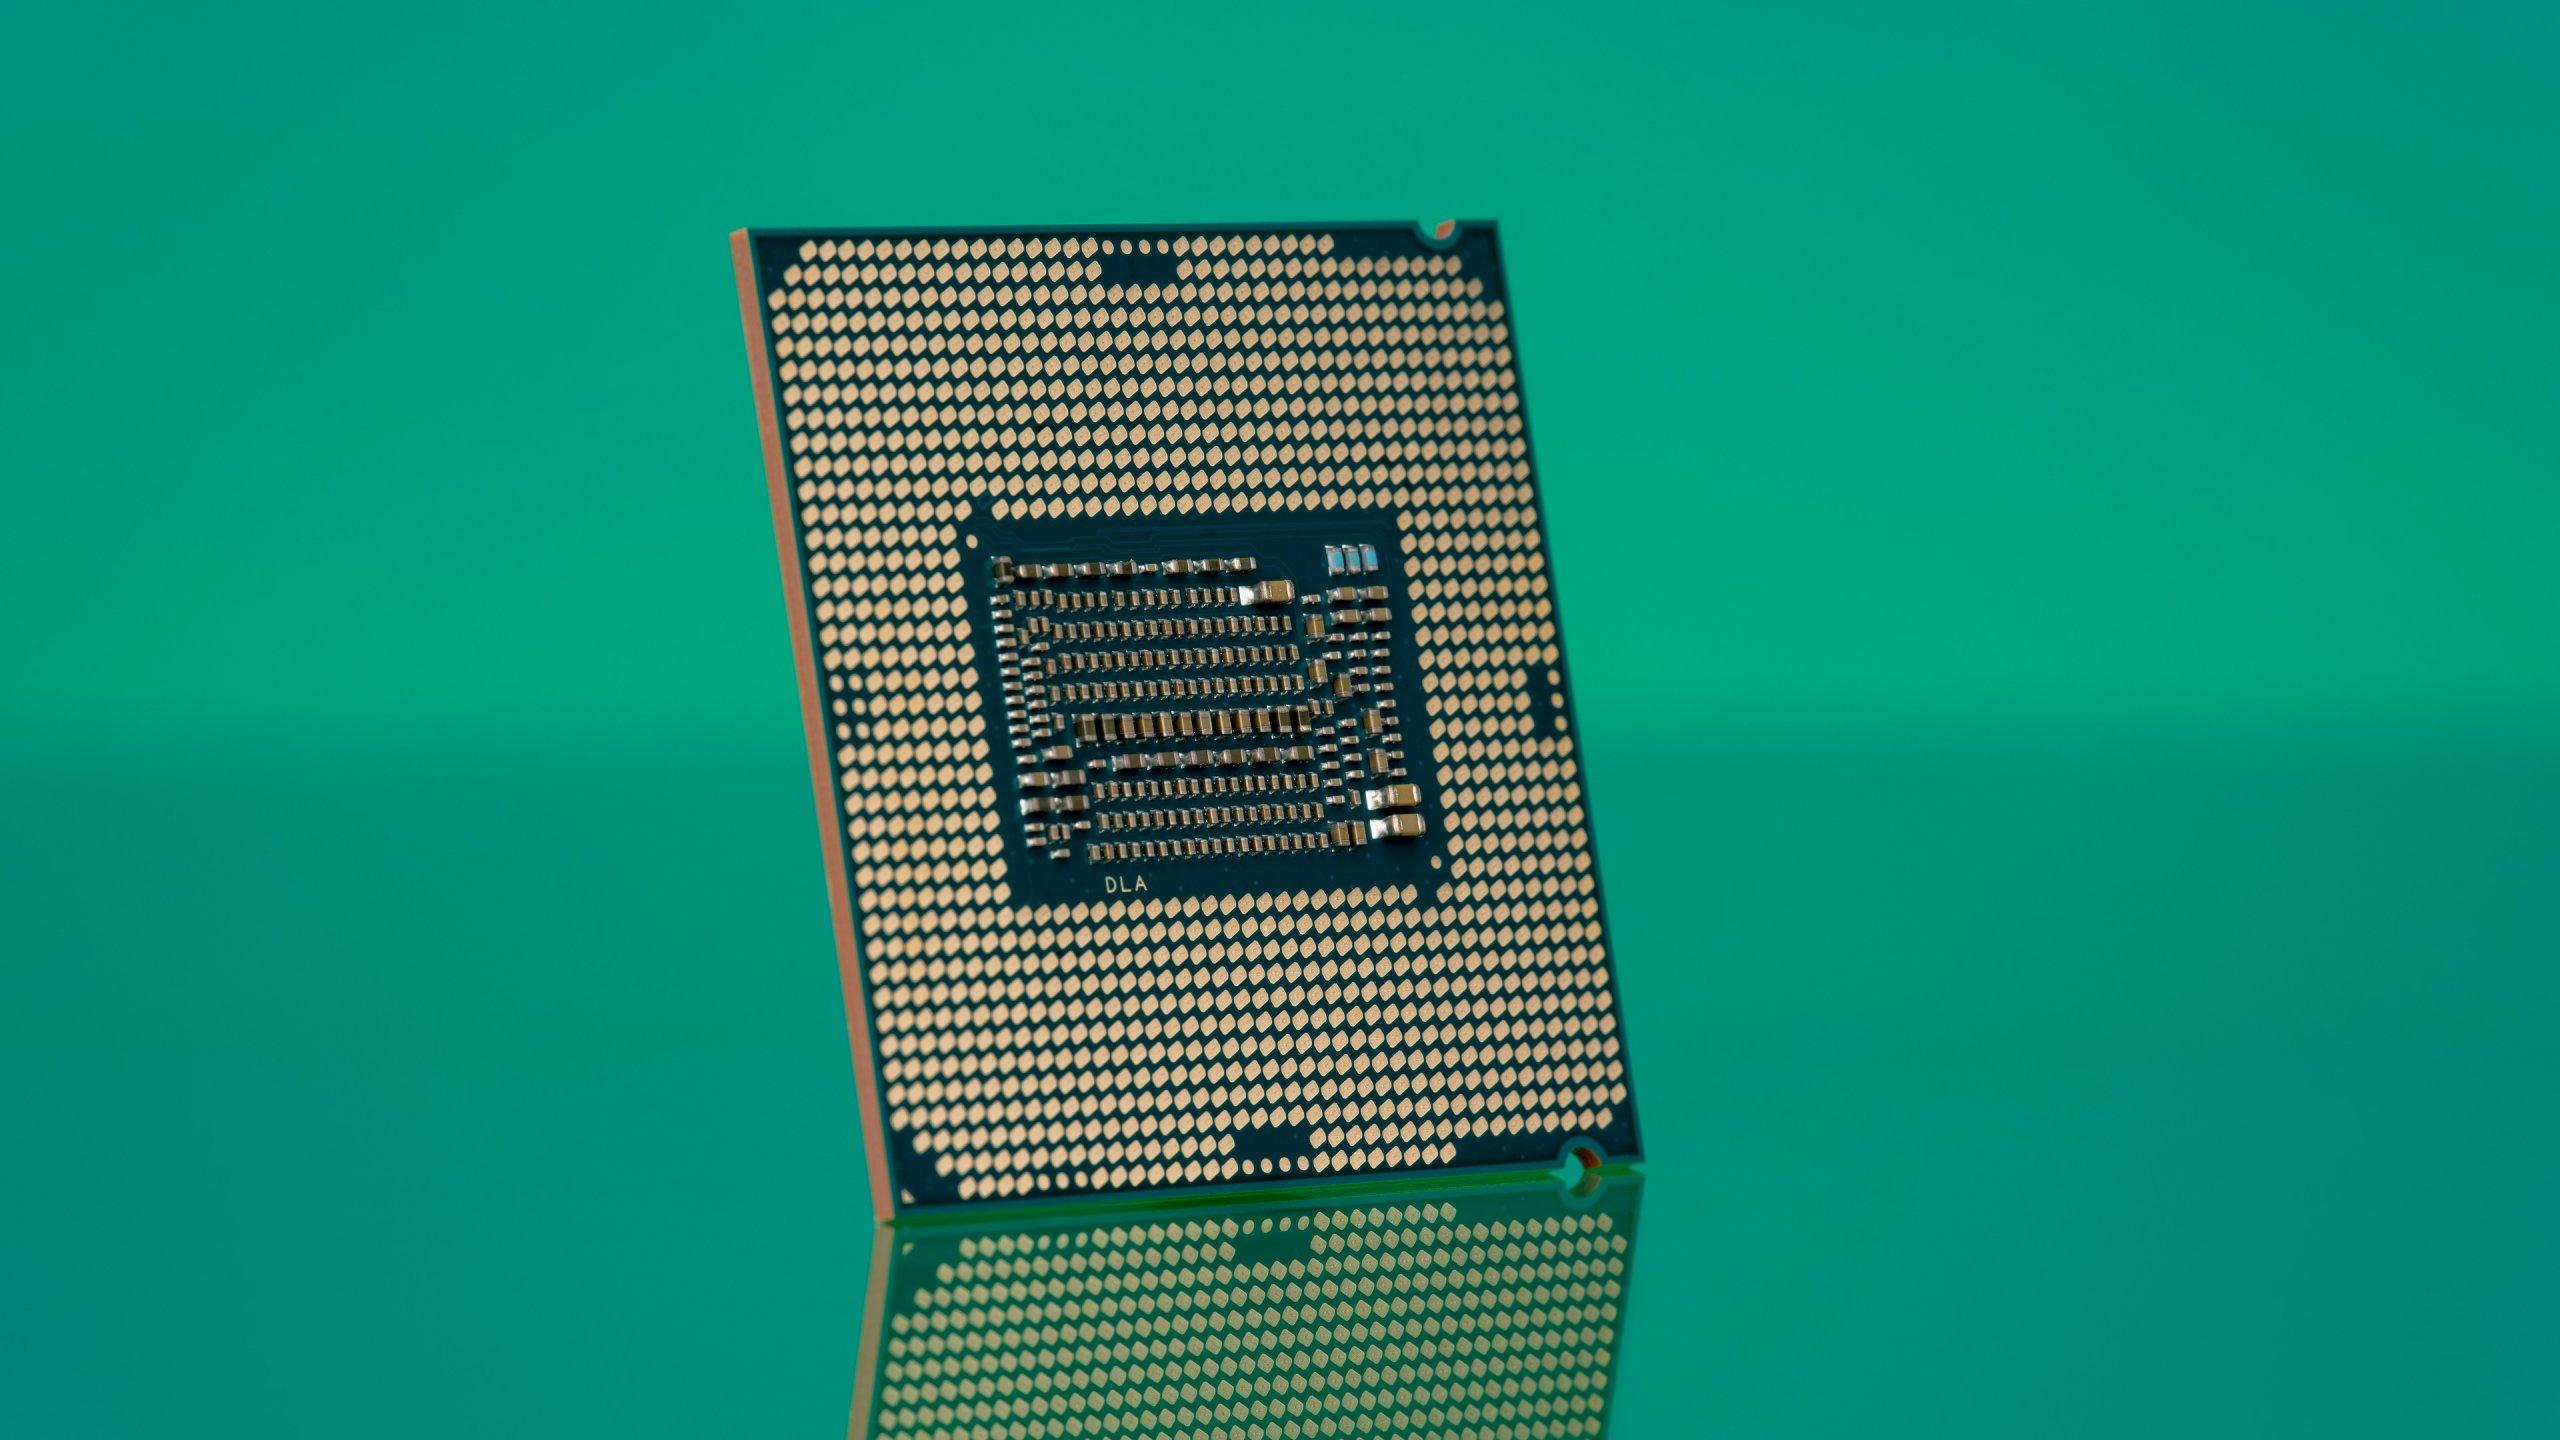 pc hardware tech wallpapers corsair intel (1)